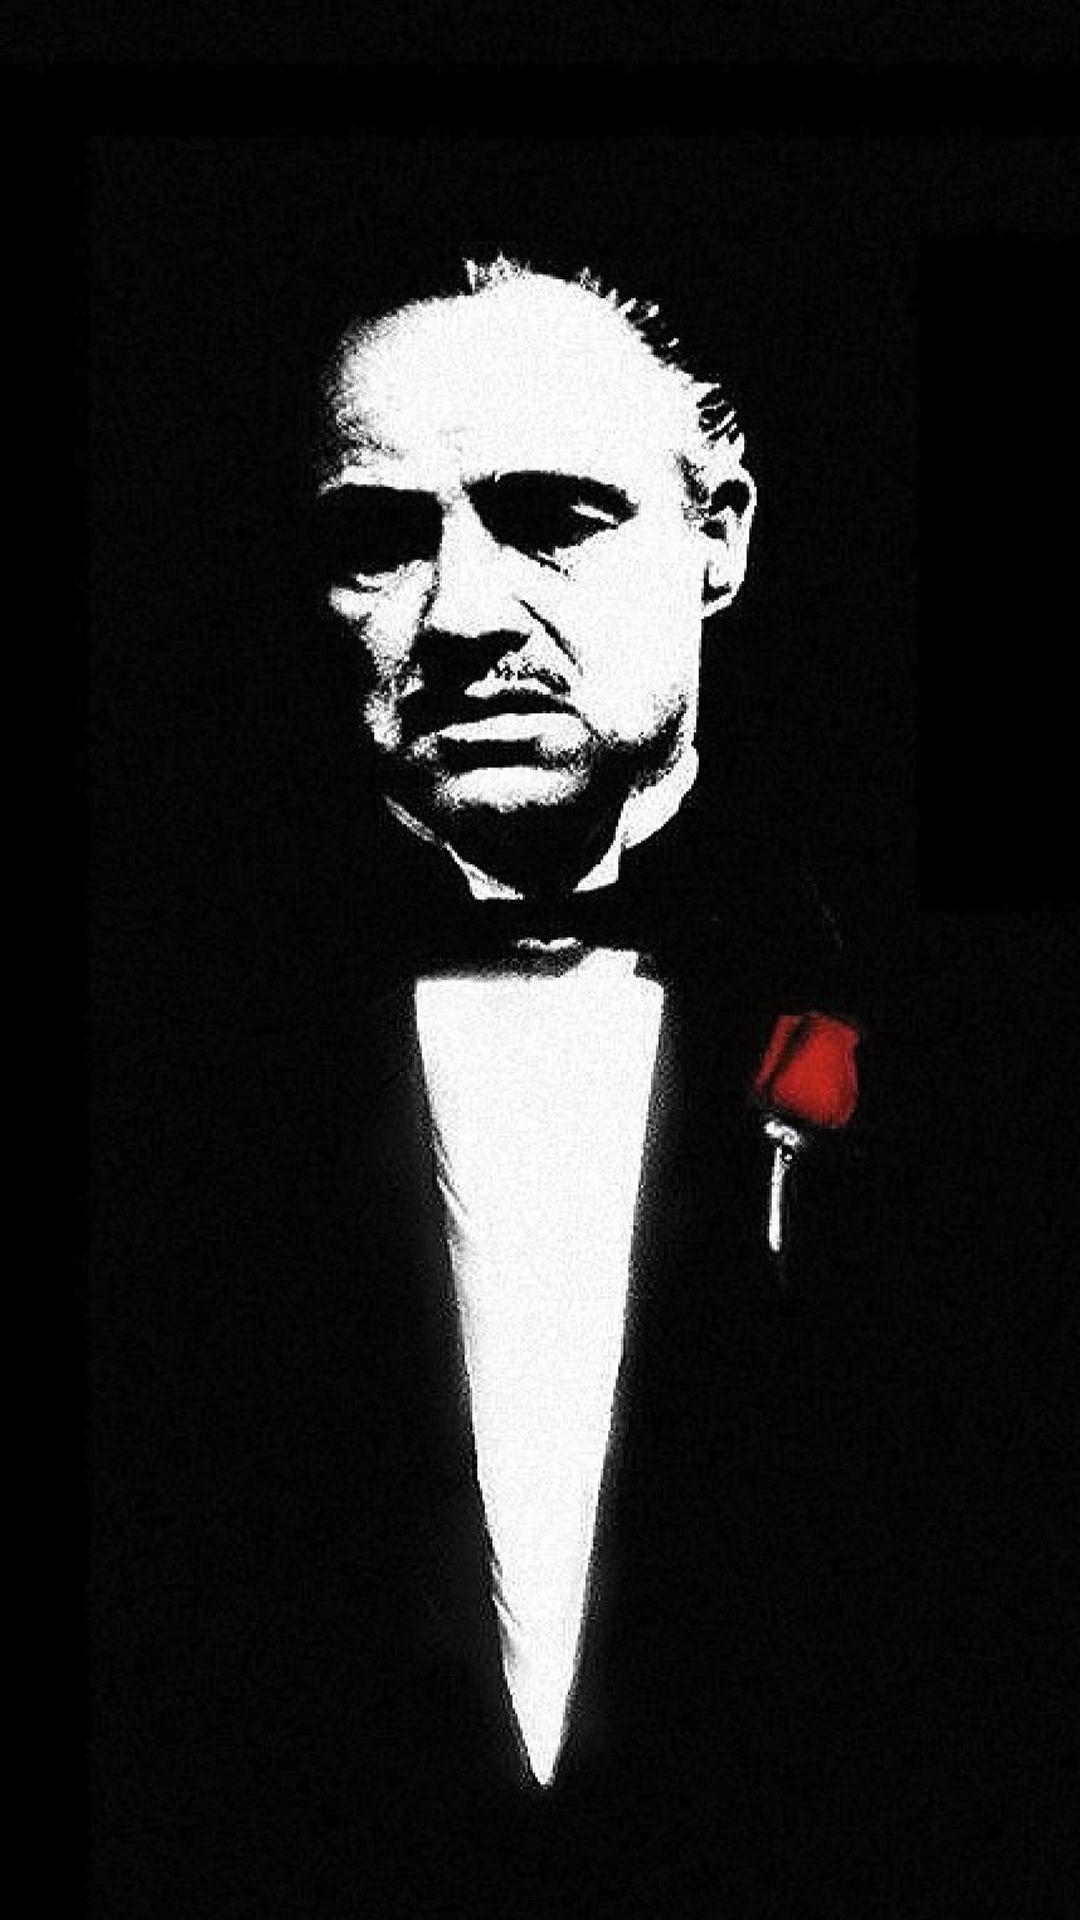 J Cole Wallpaper Iphone - Godfather Portrait - HD Wallpaper